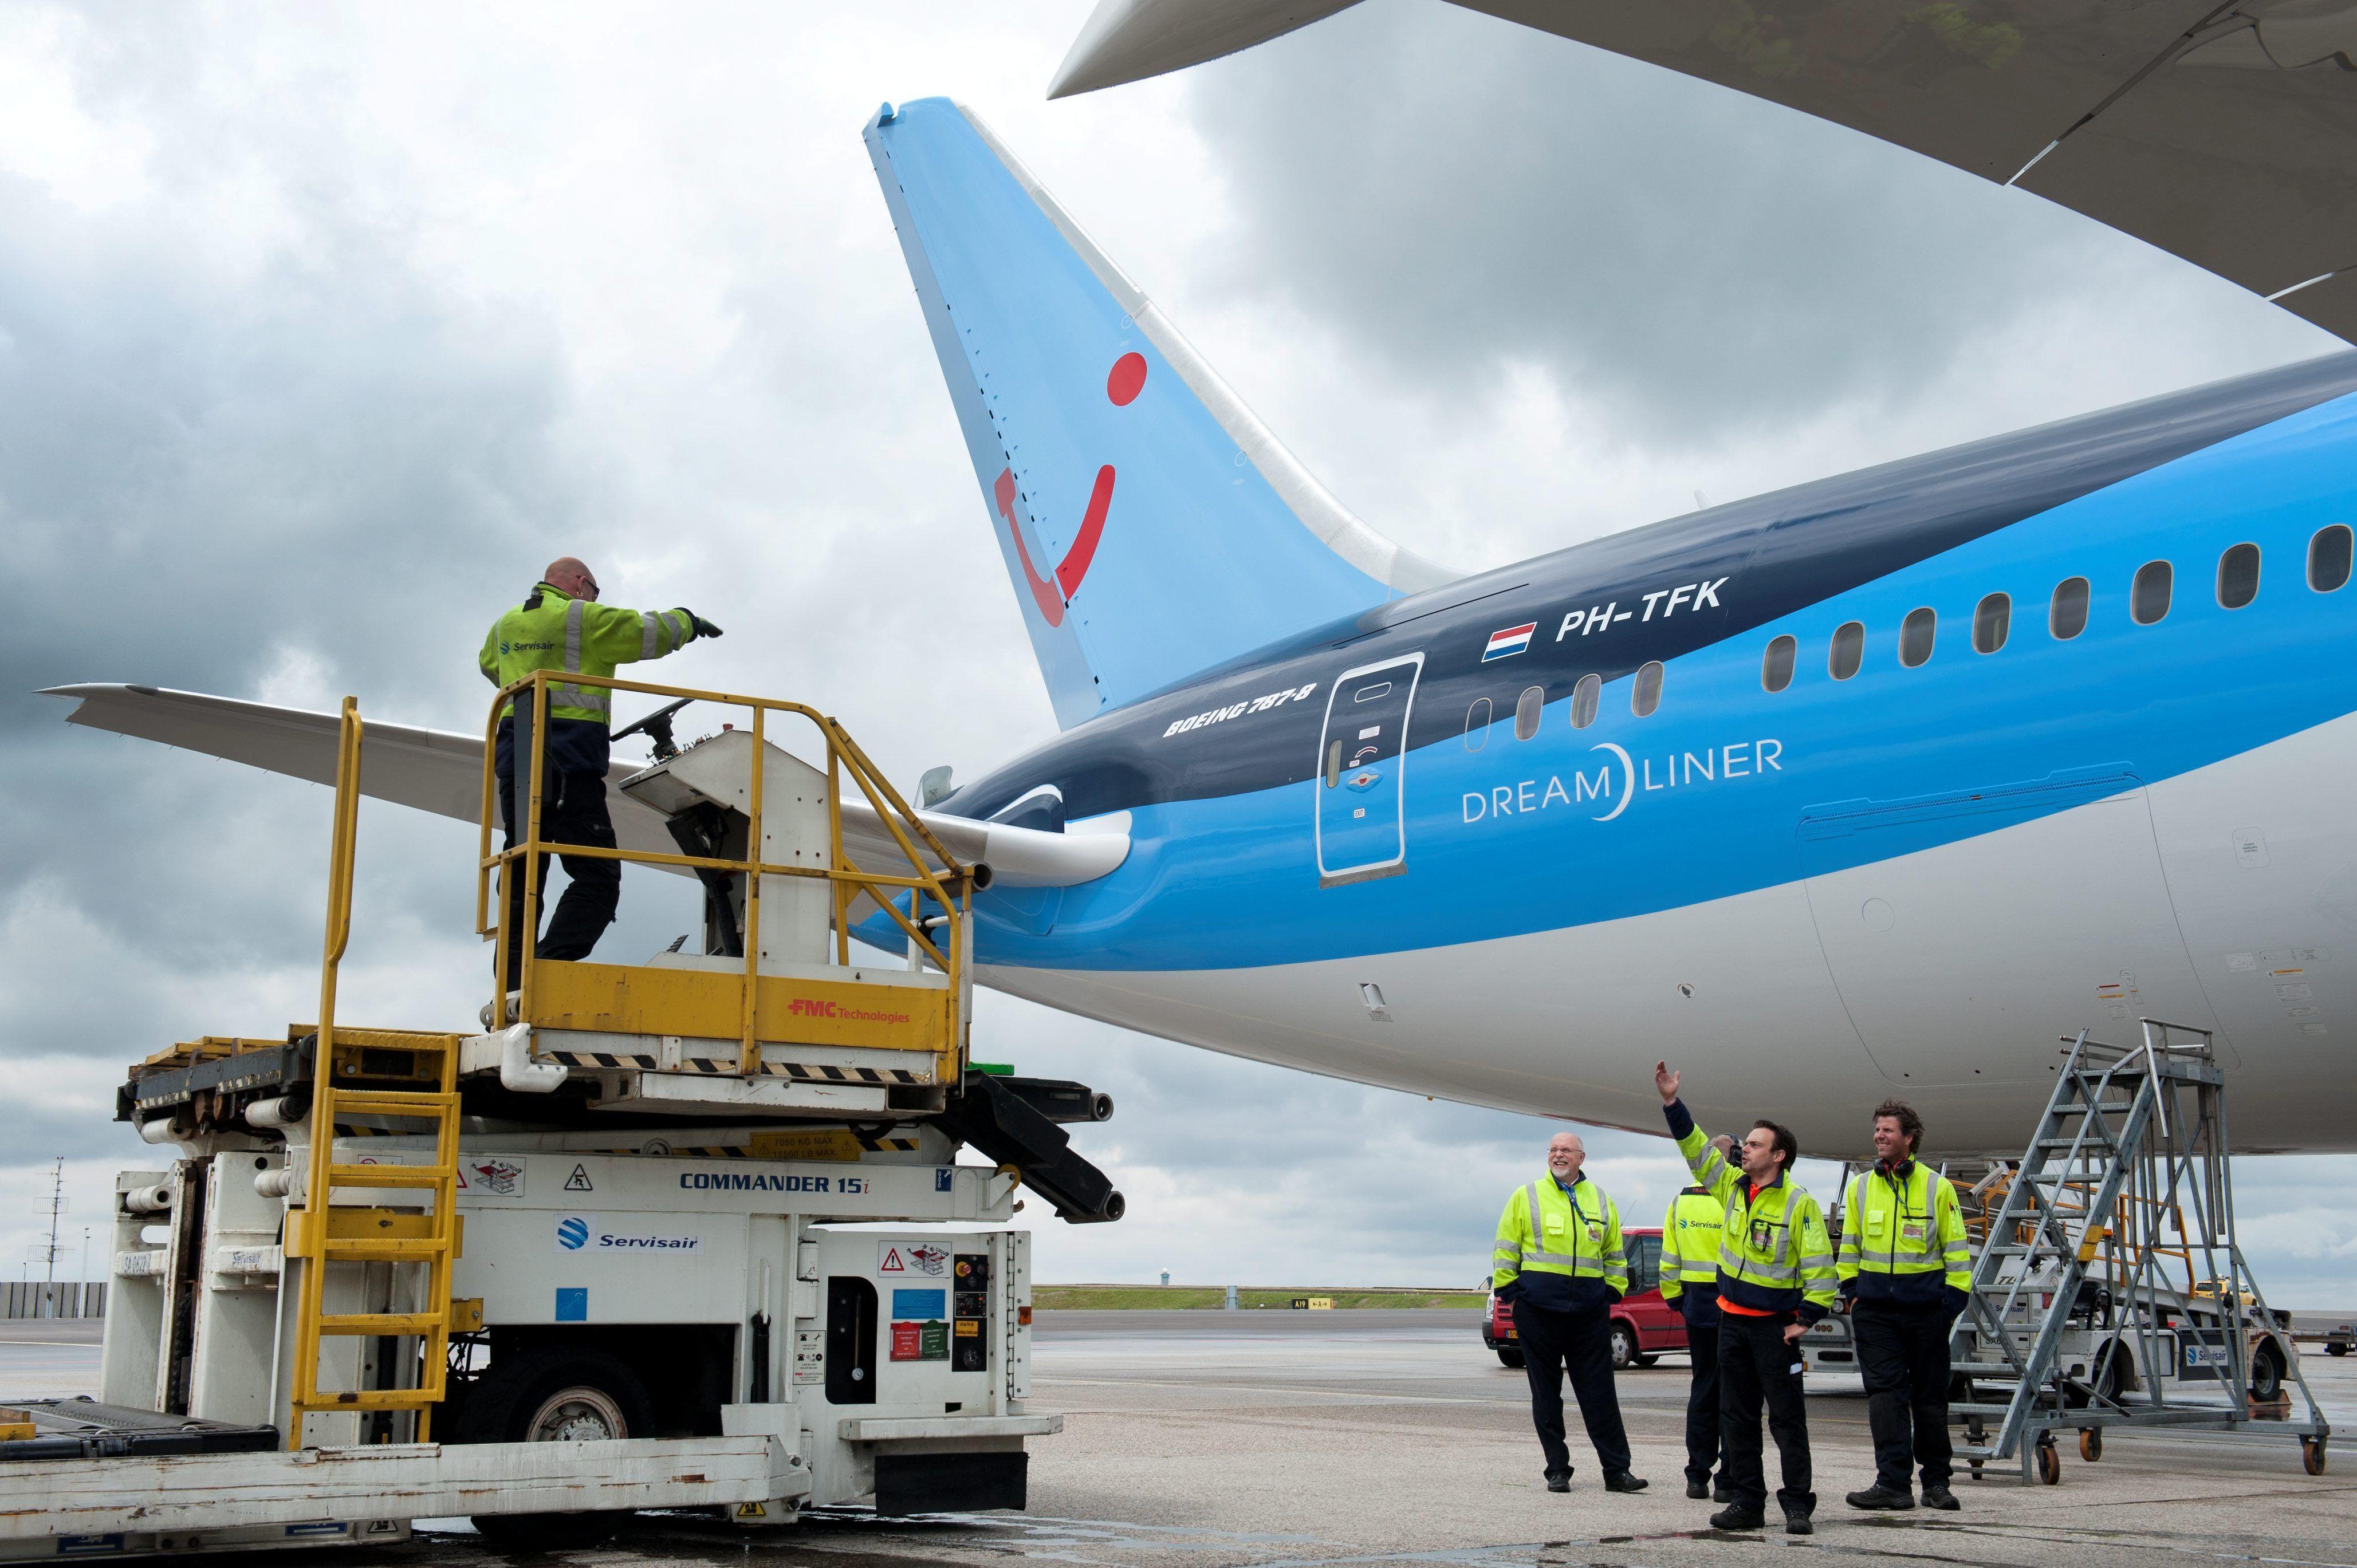 Bevoorrading Van De Tuifly Kist Vliegtuig Kist